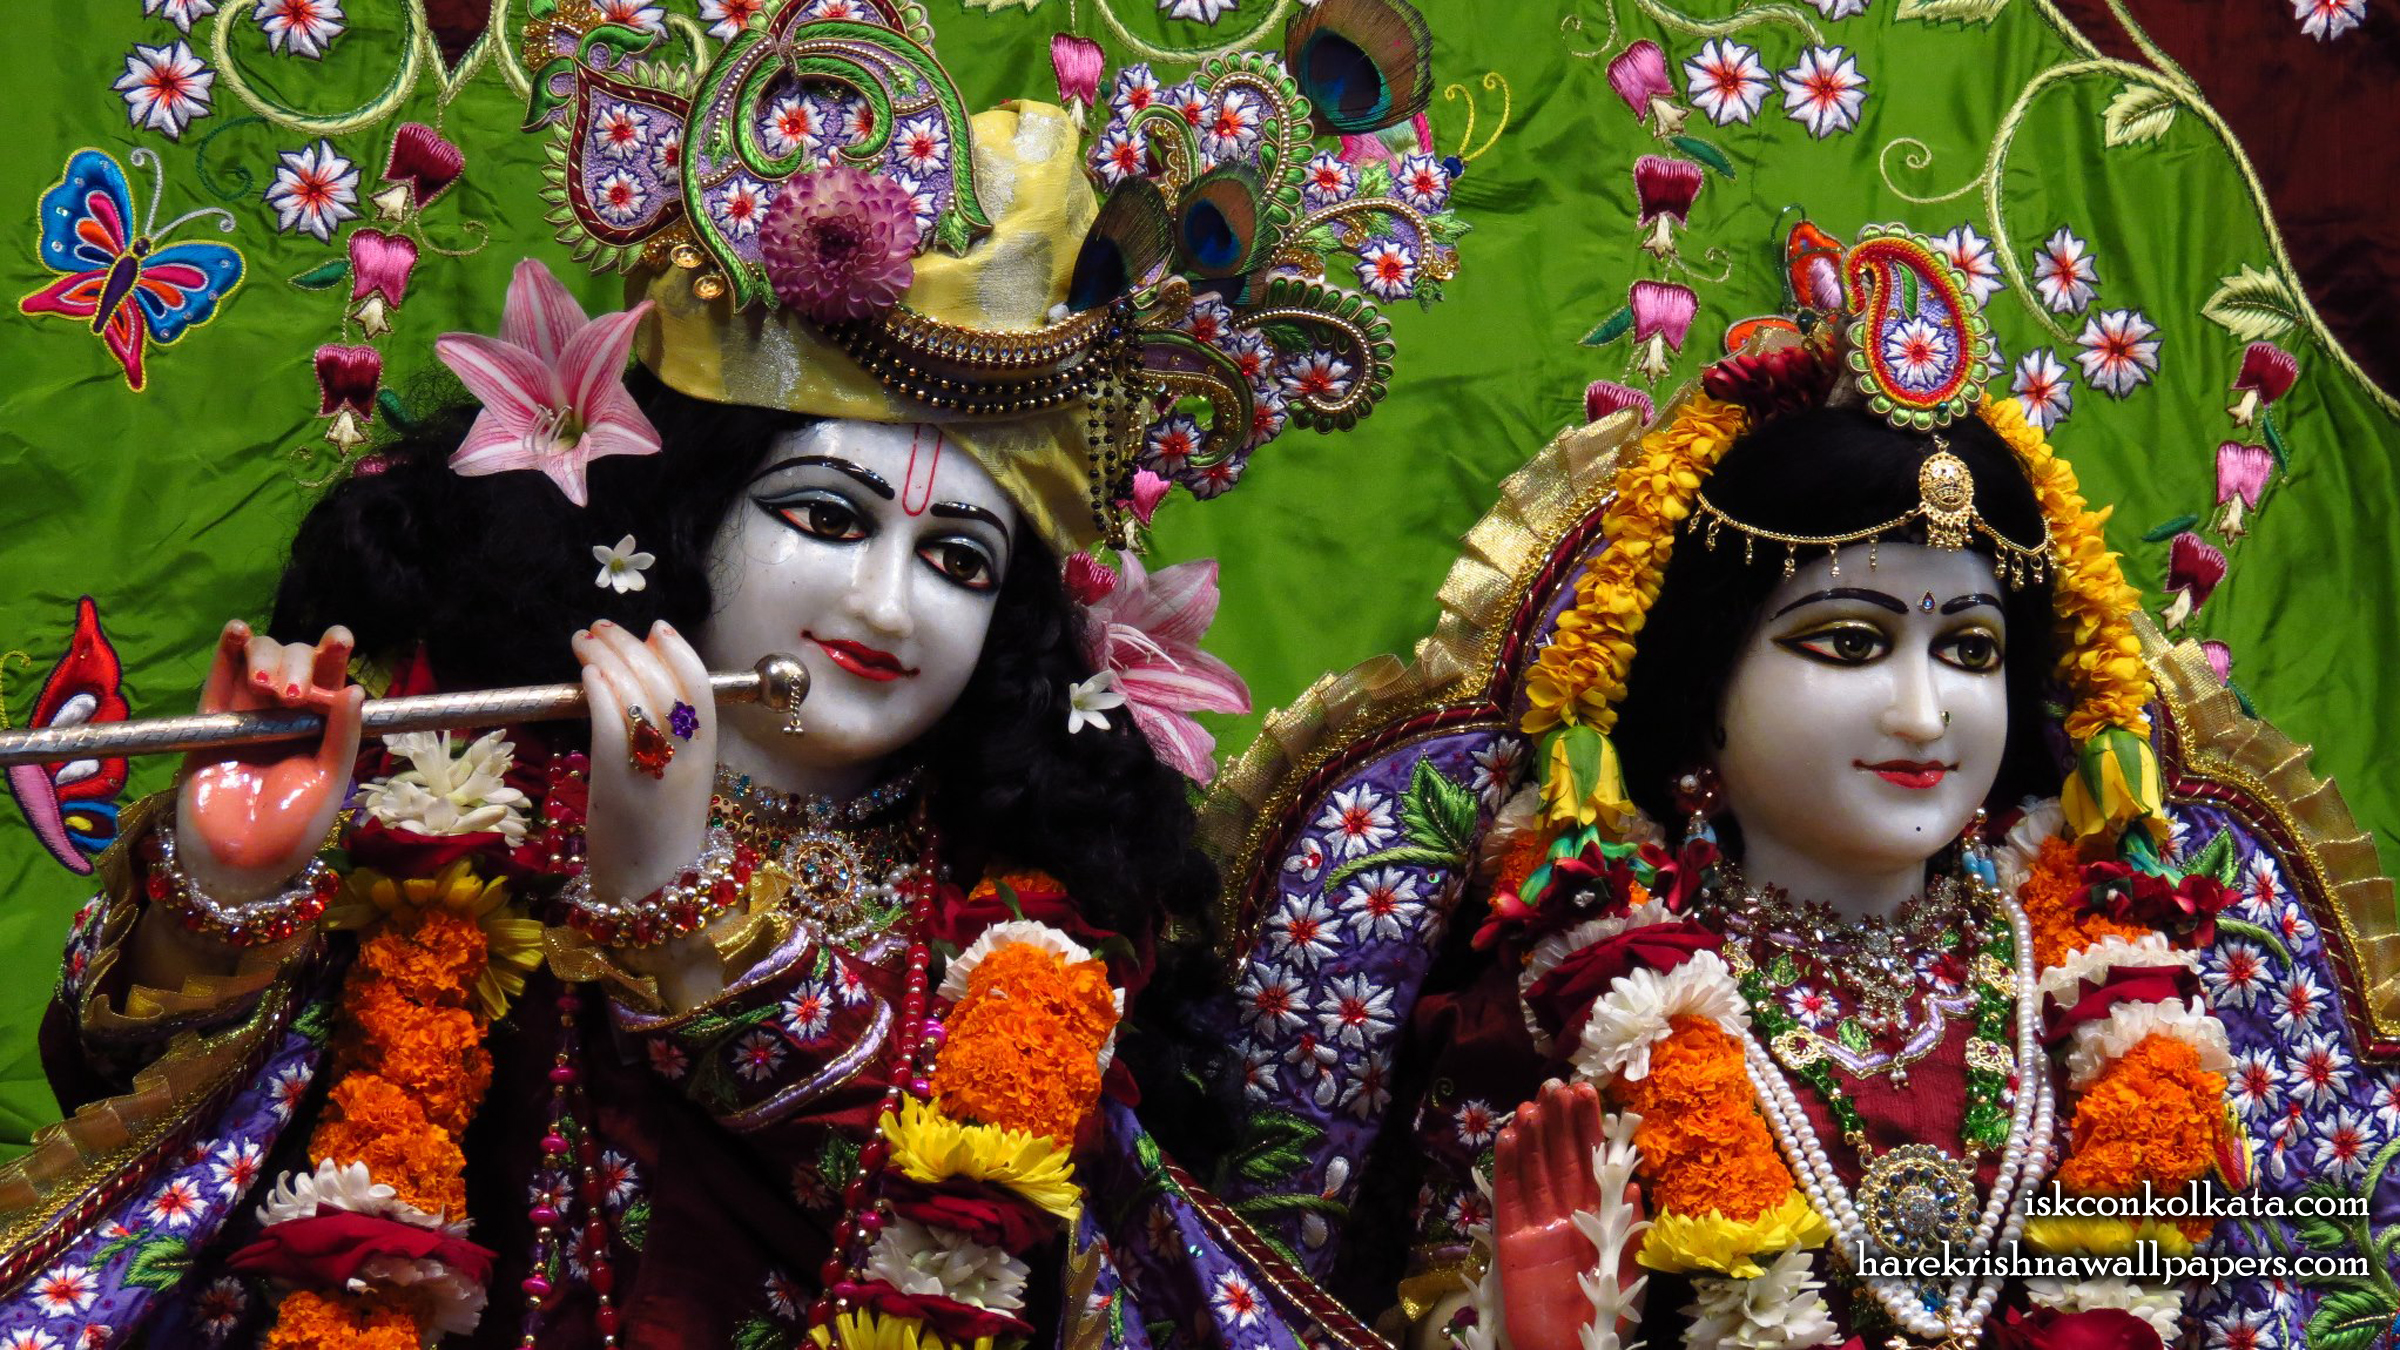 Sri Sri Radha Govinda Close up Wallpaper (005) Size 2400x1350 Download